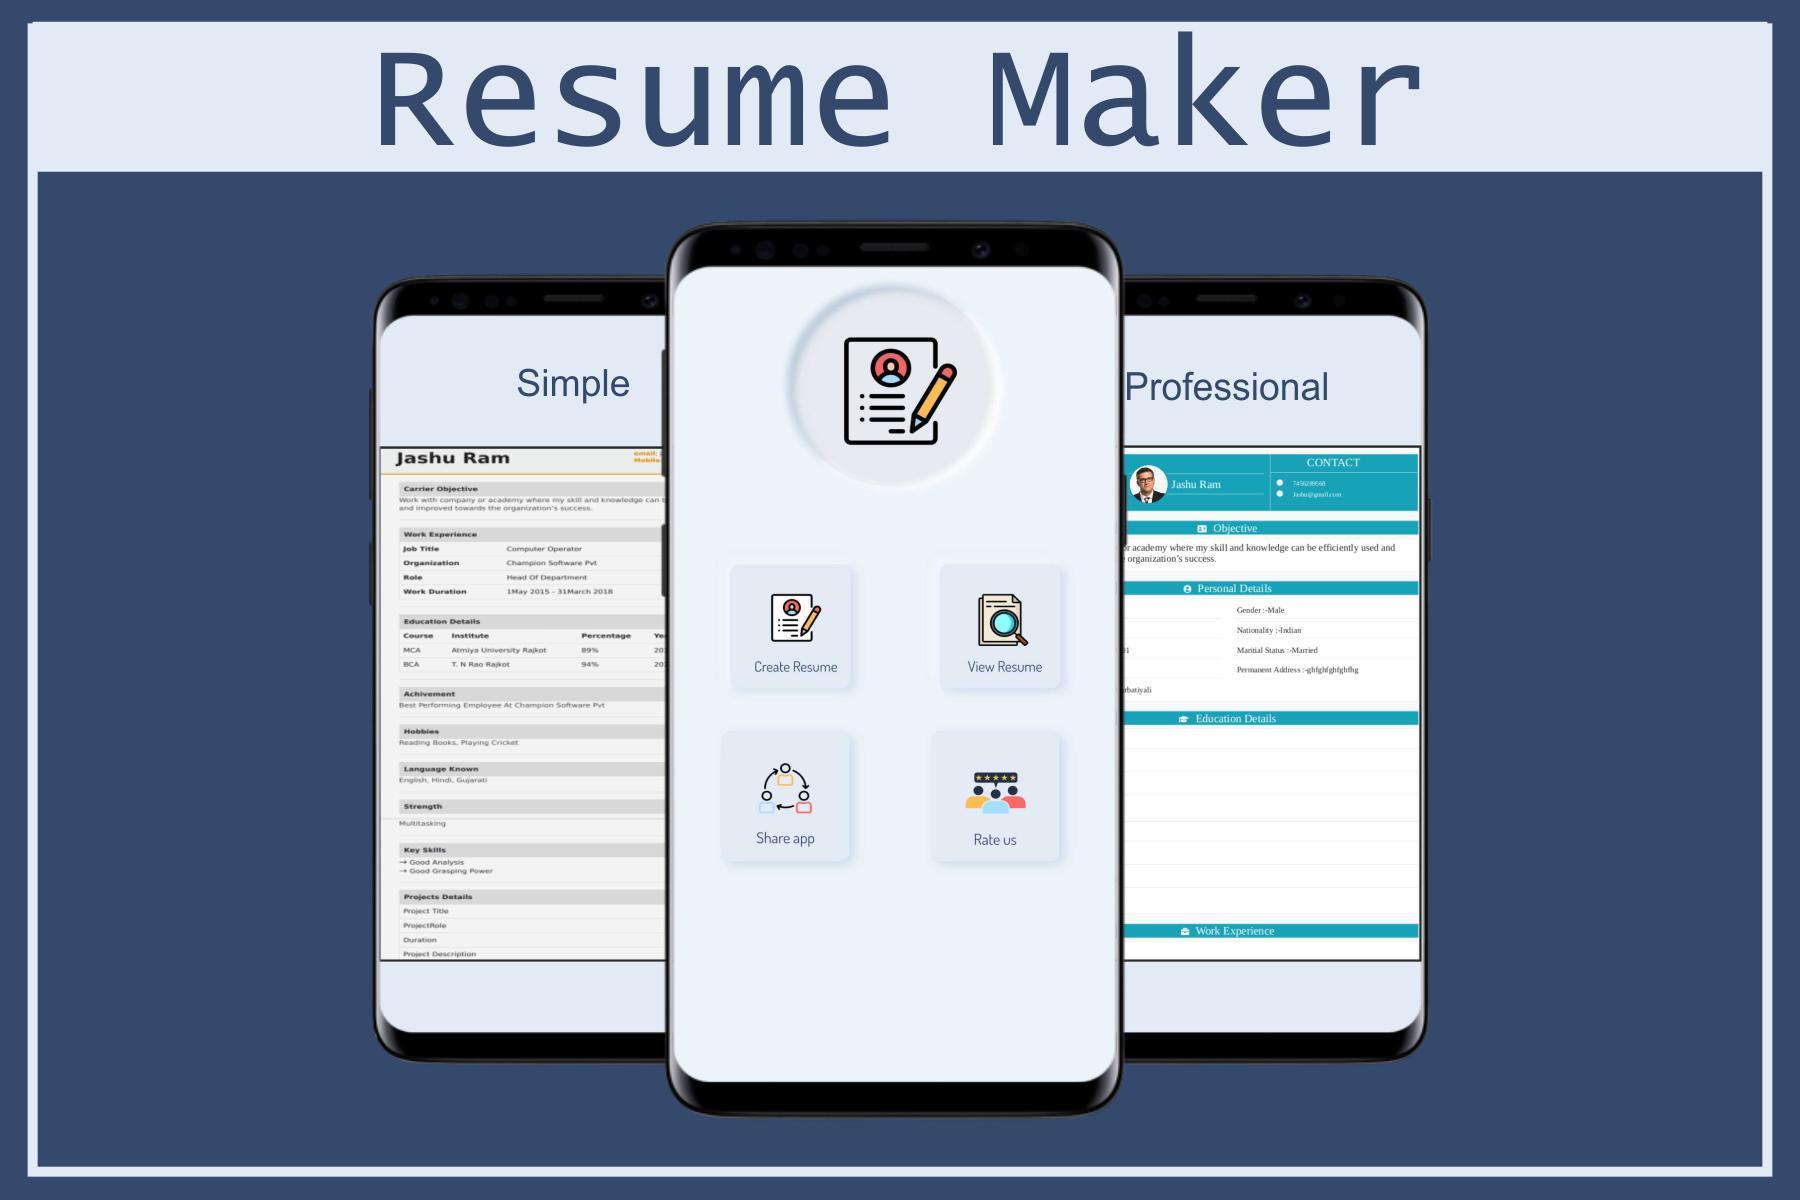 Resume Builder App Free Cv Maker App Freshers Pdf For Android Apk Download